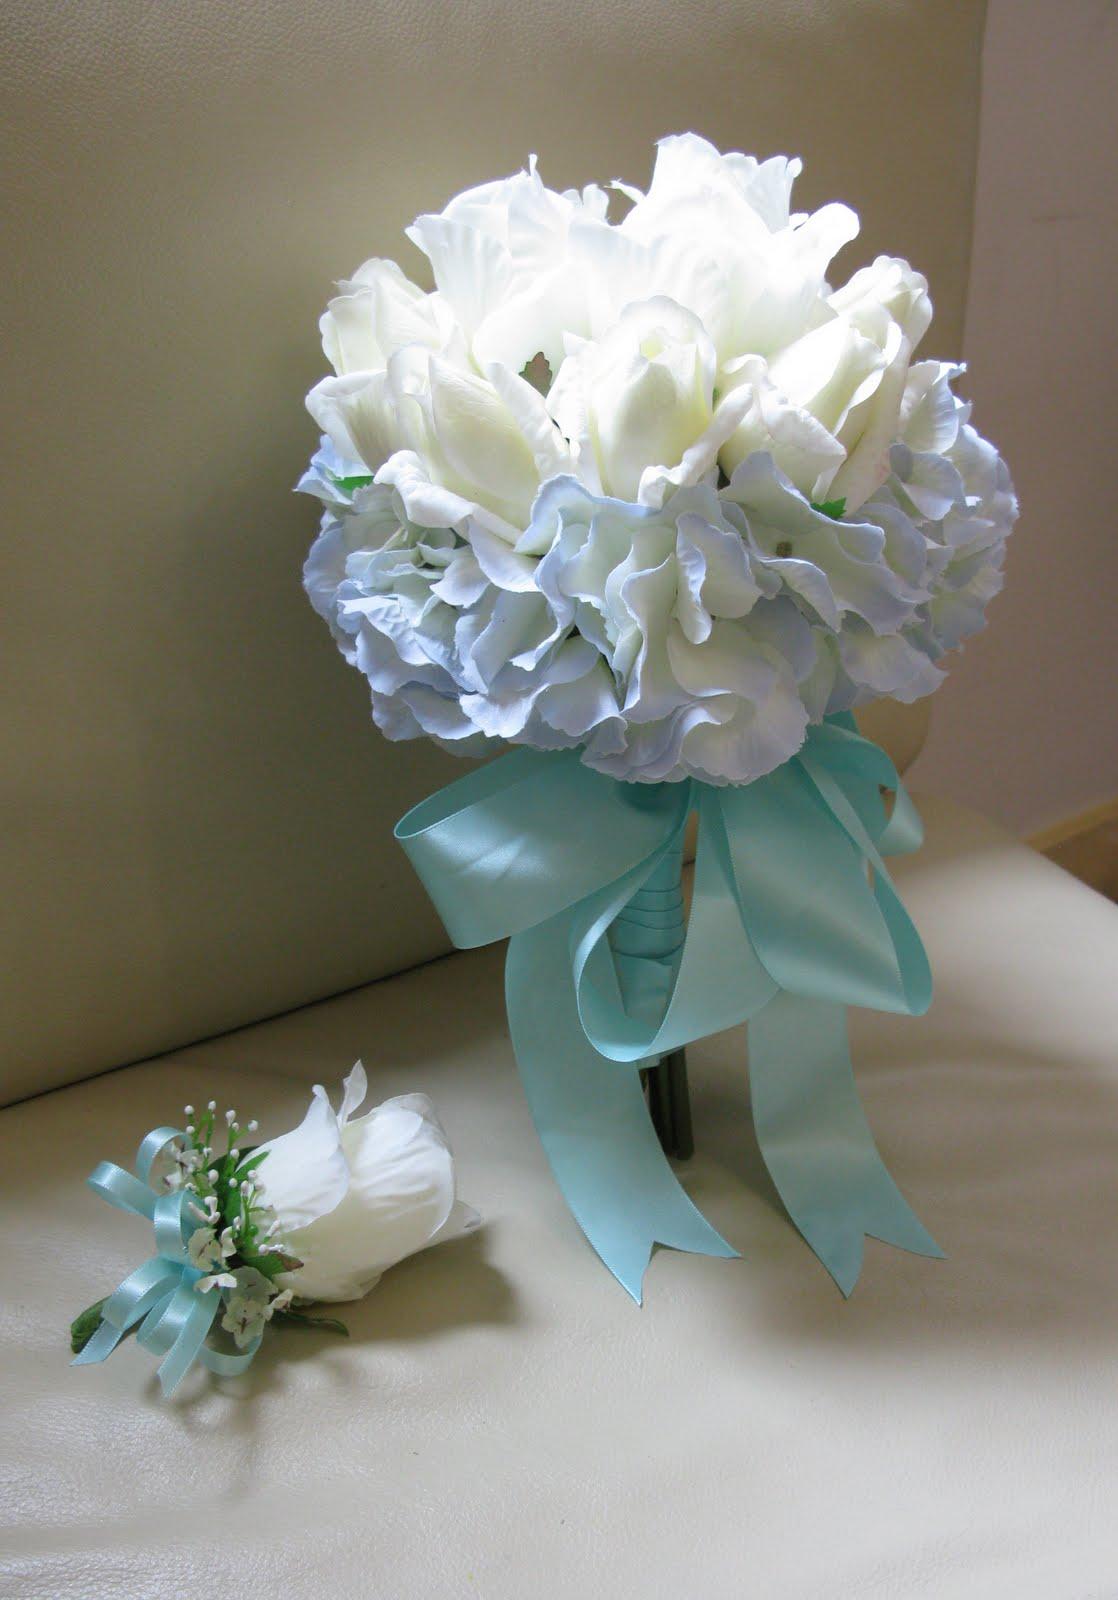 qualified blue hydrangeas bouquet b0940850 blue hydrangea ... |Light Blue Hydrangea Bouquet